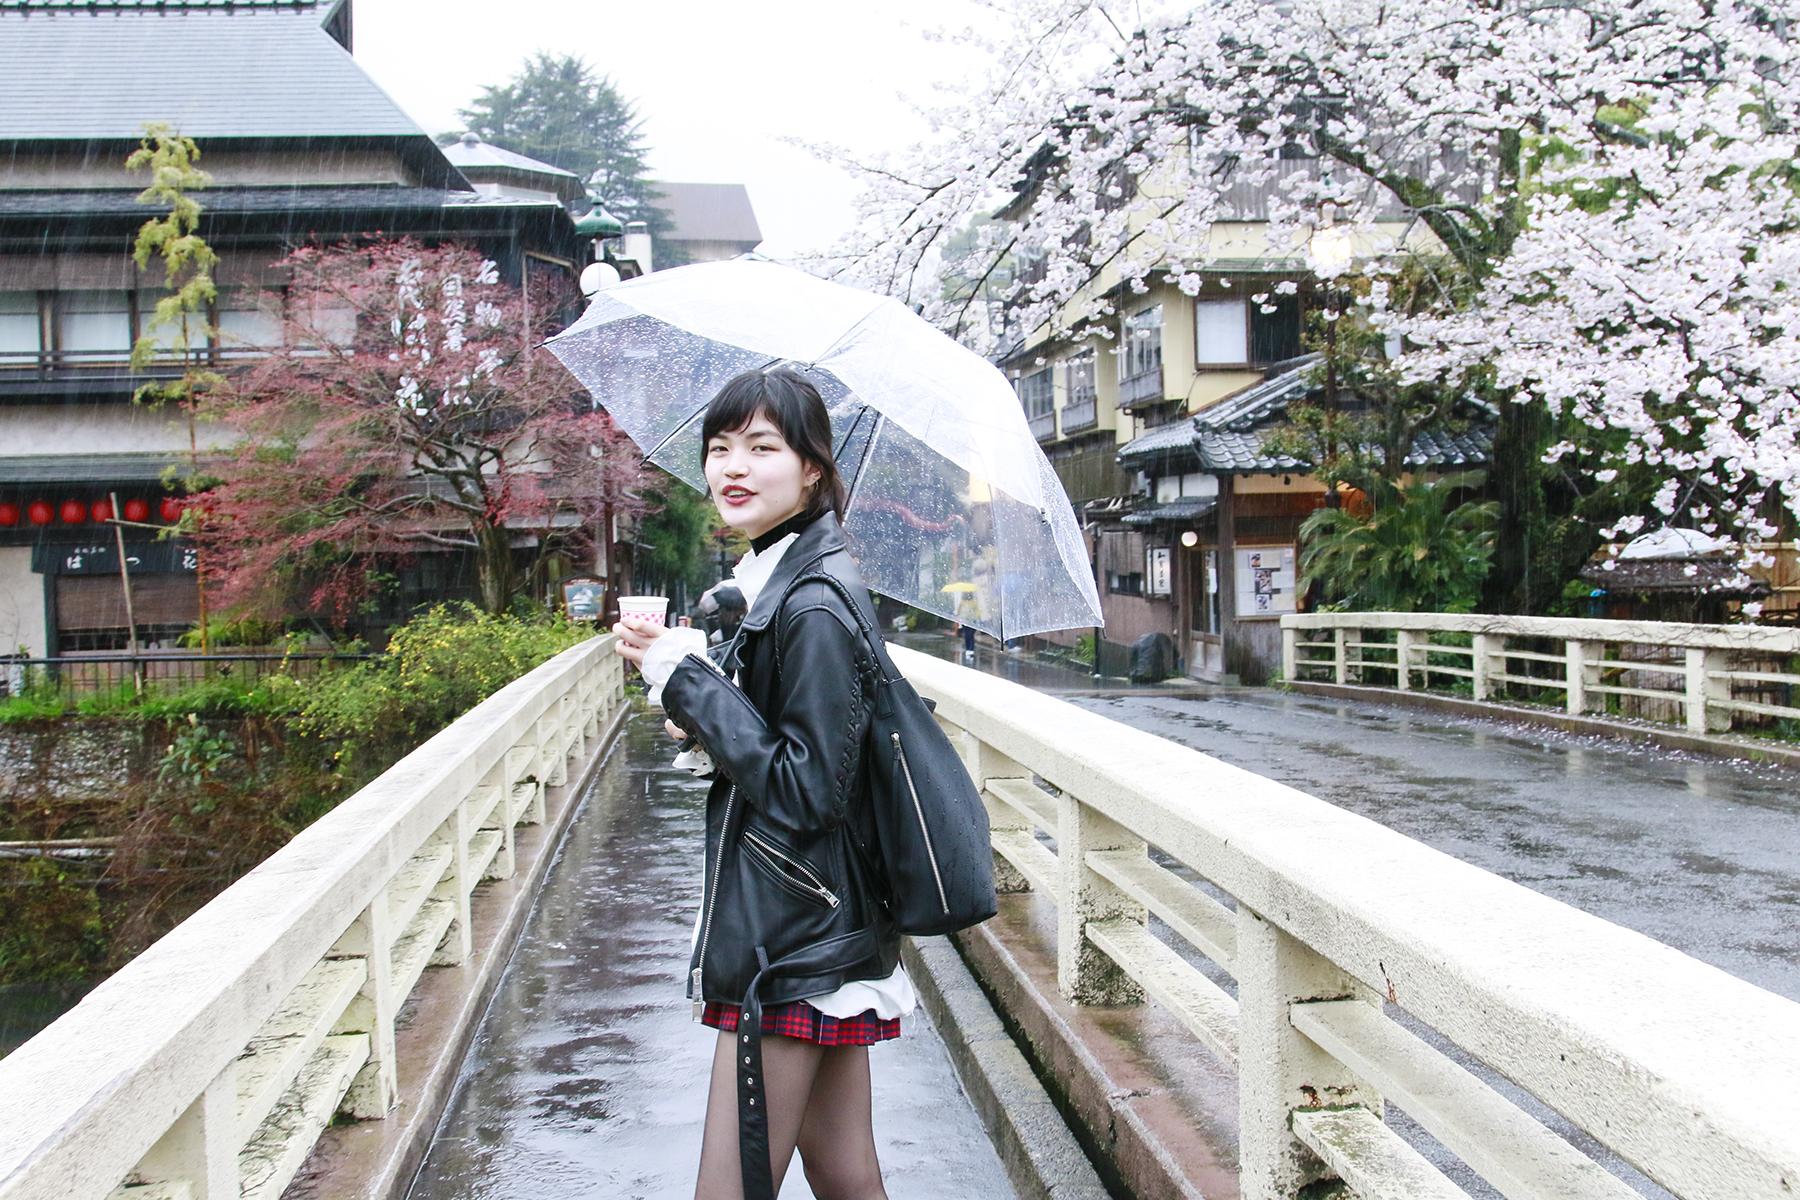 ALLSAINTS_Rina Fukushi_10